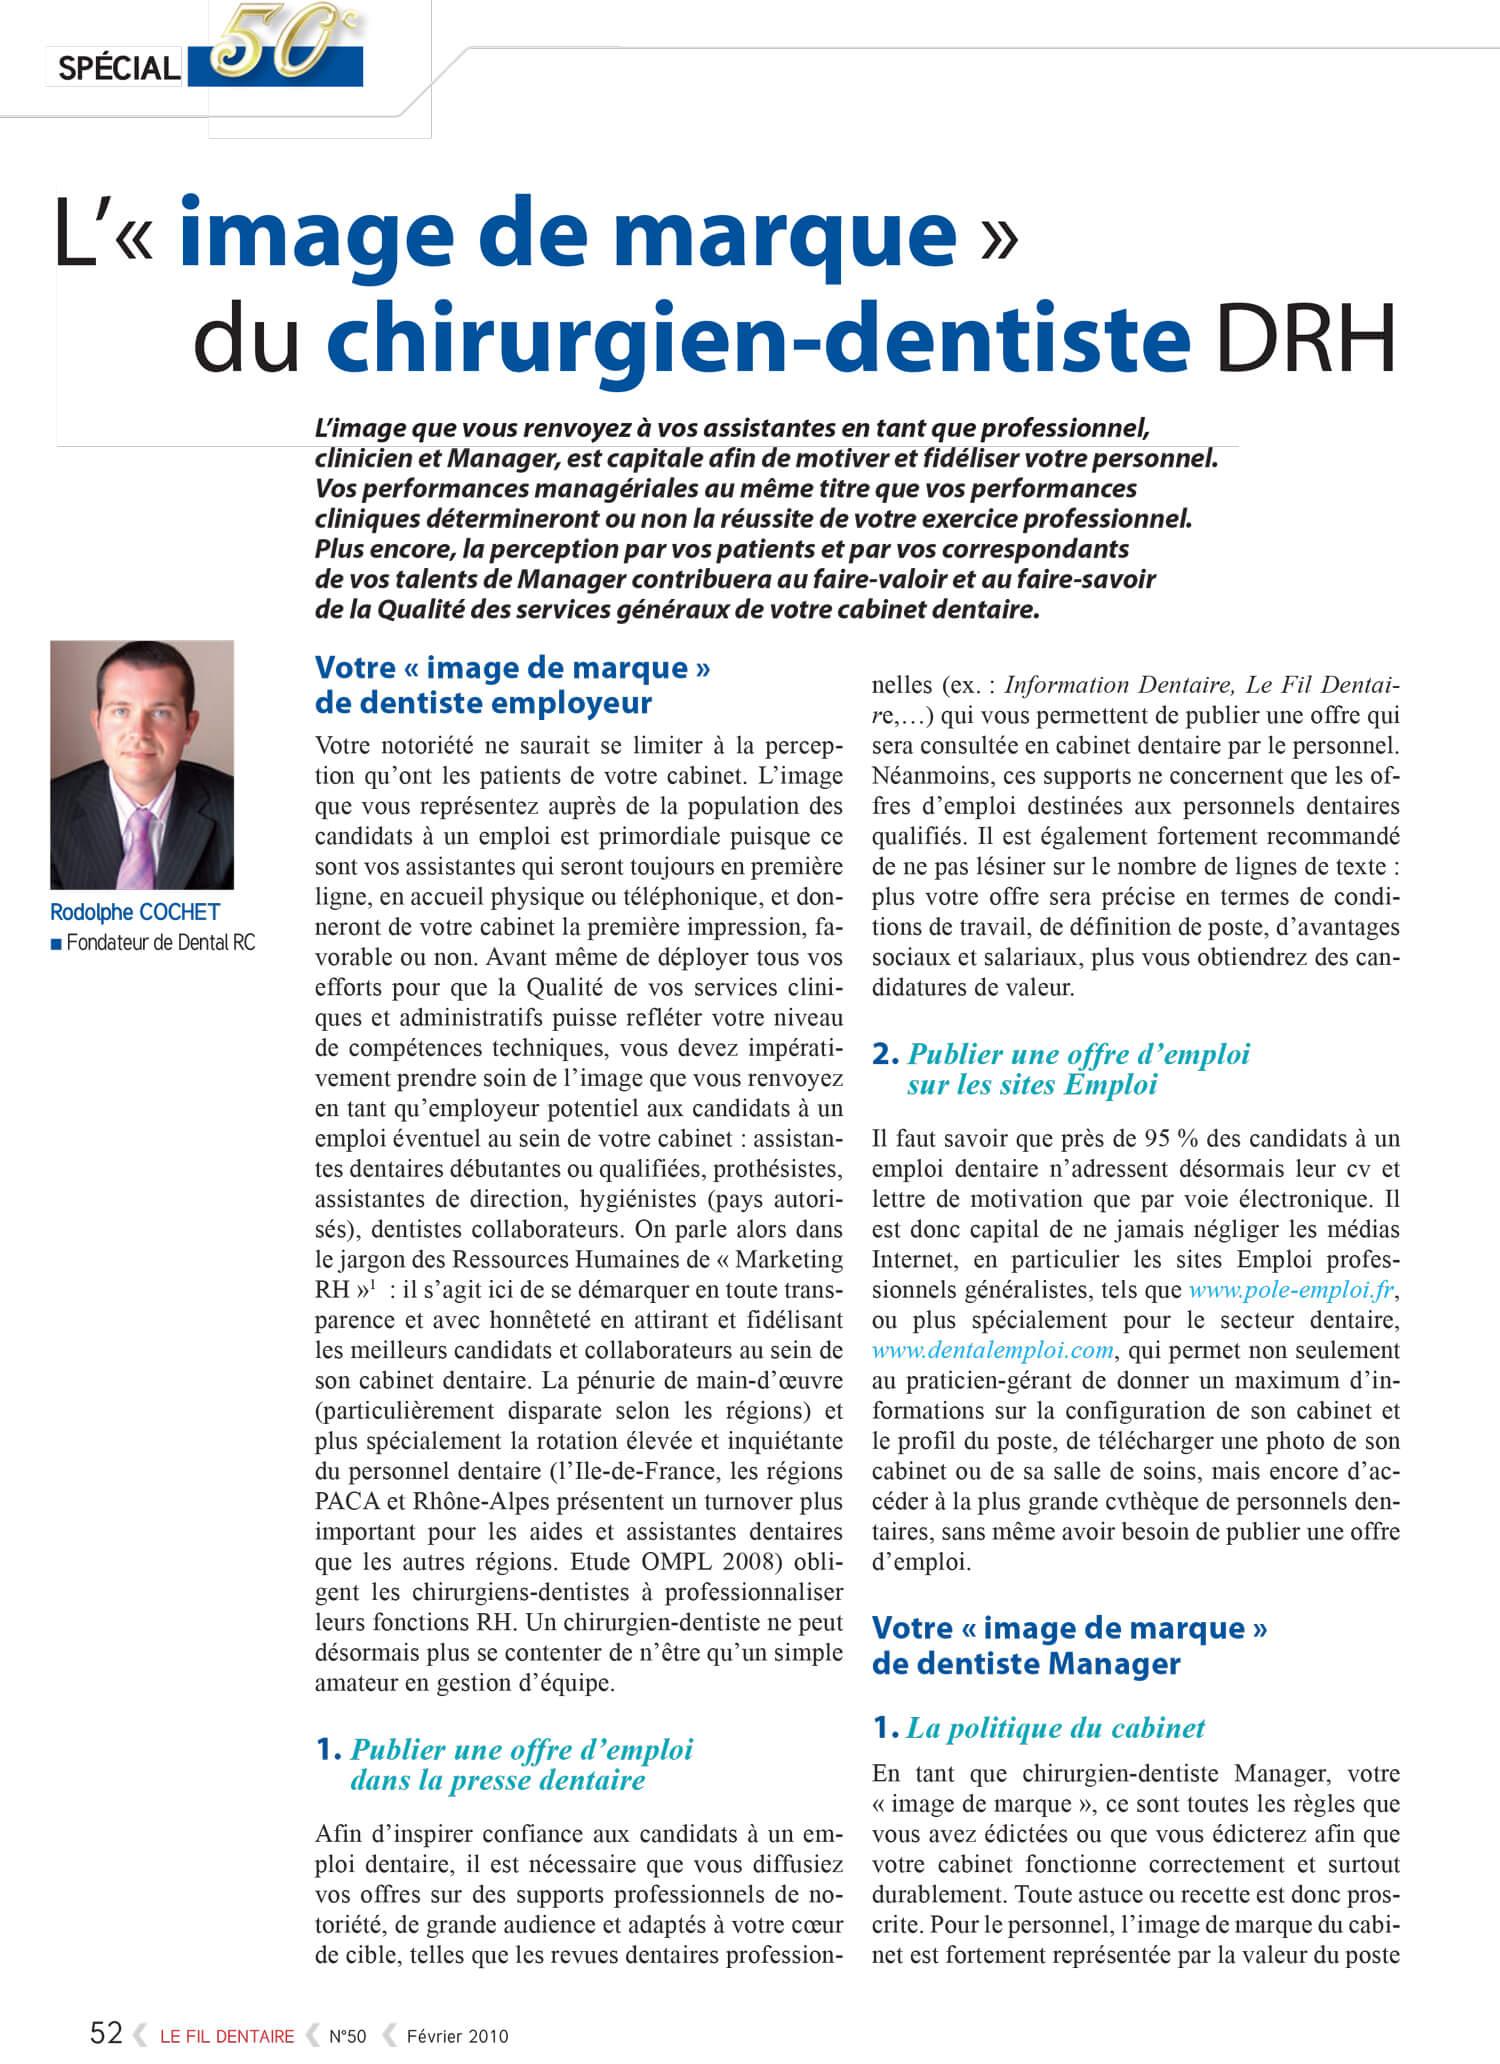 image-marque-dentiste-drh-manager-dentaire-management-rodolphe-cochet.jpg